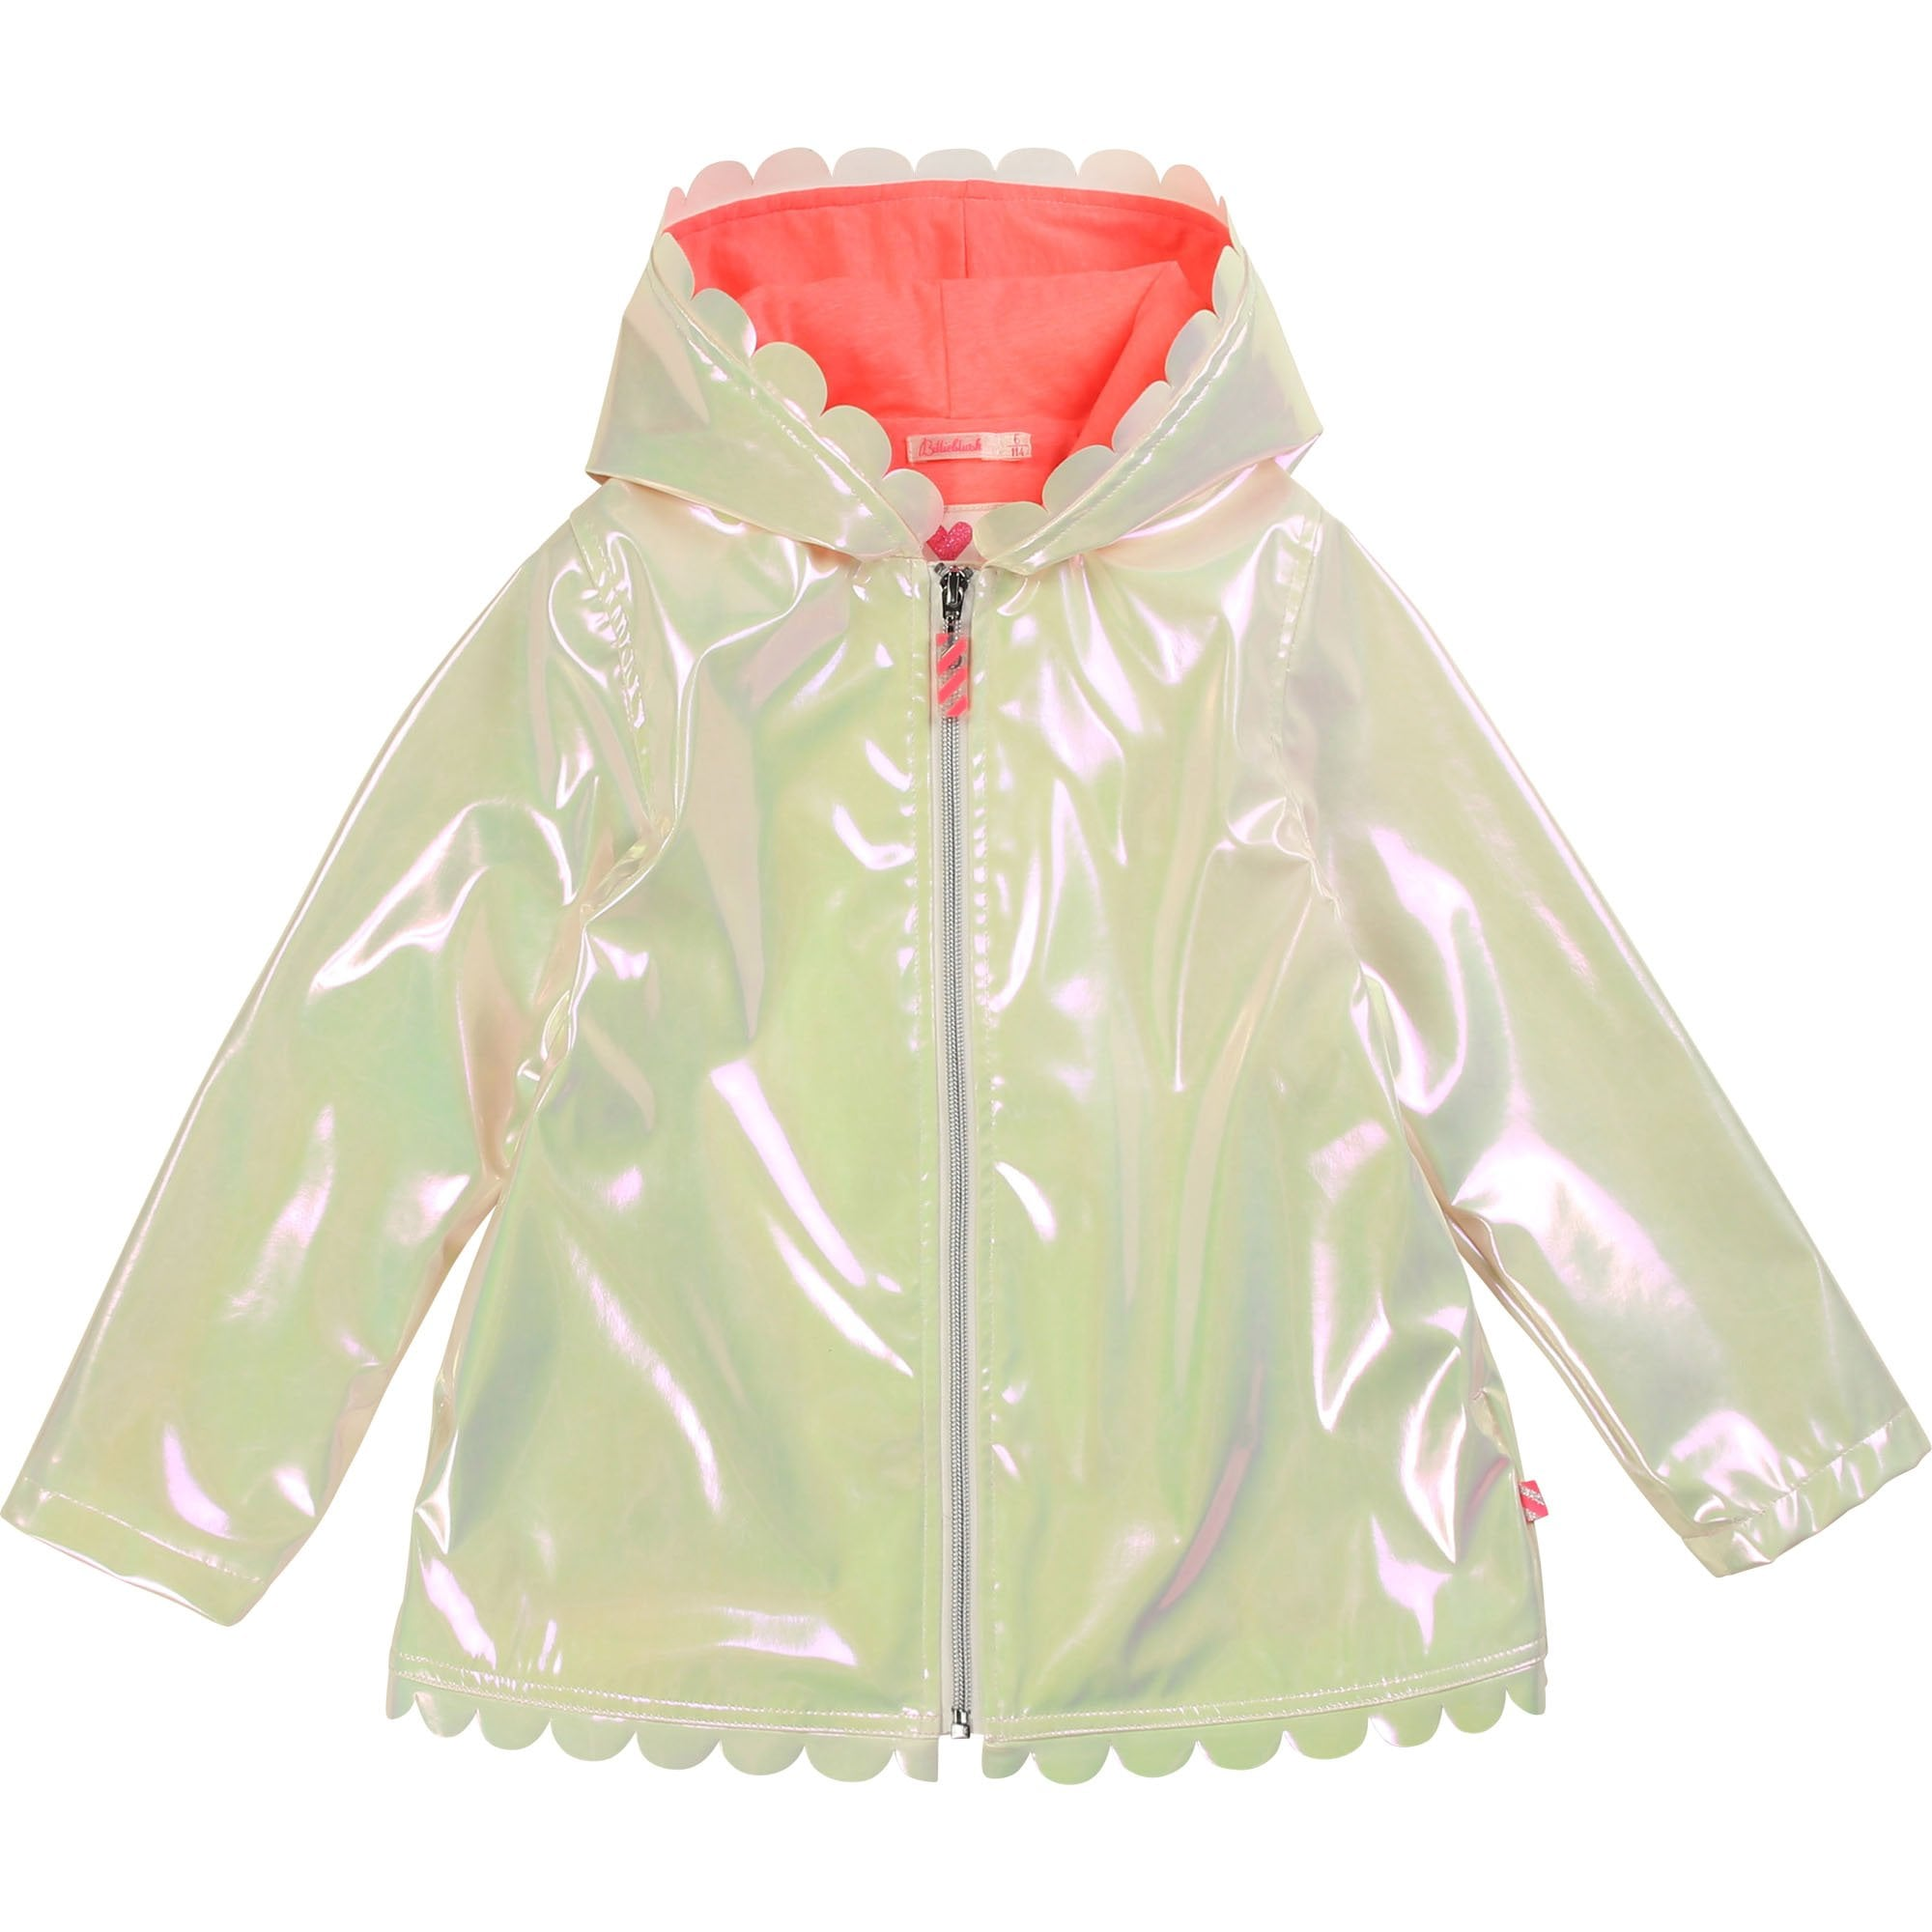 Billieblush Girls Lined Raincoat